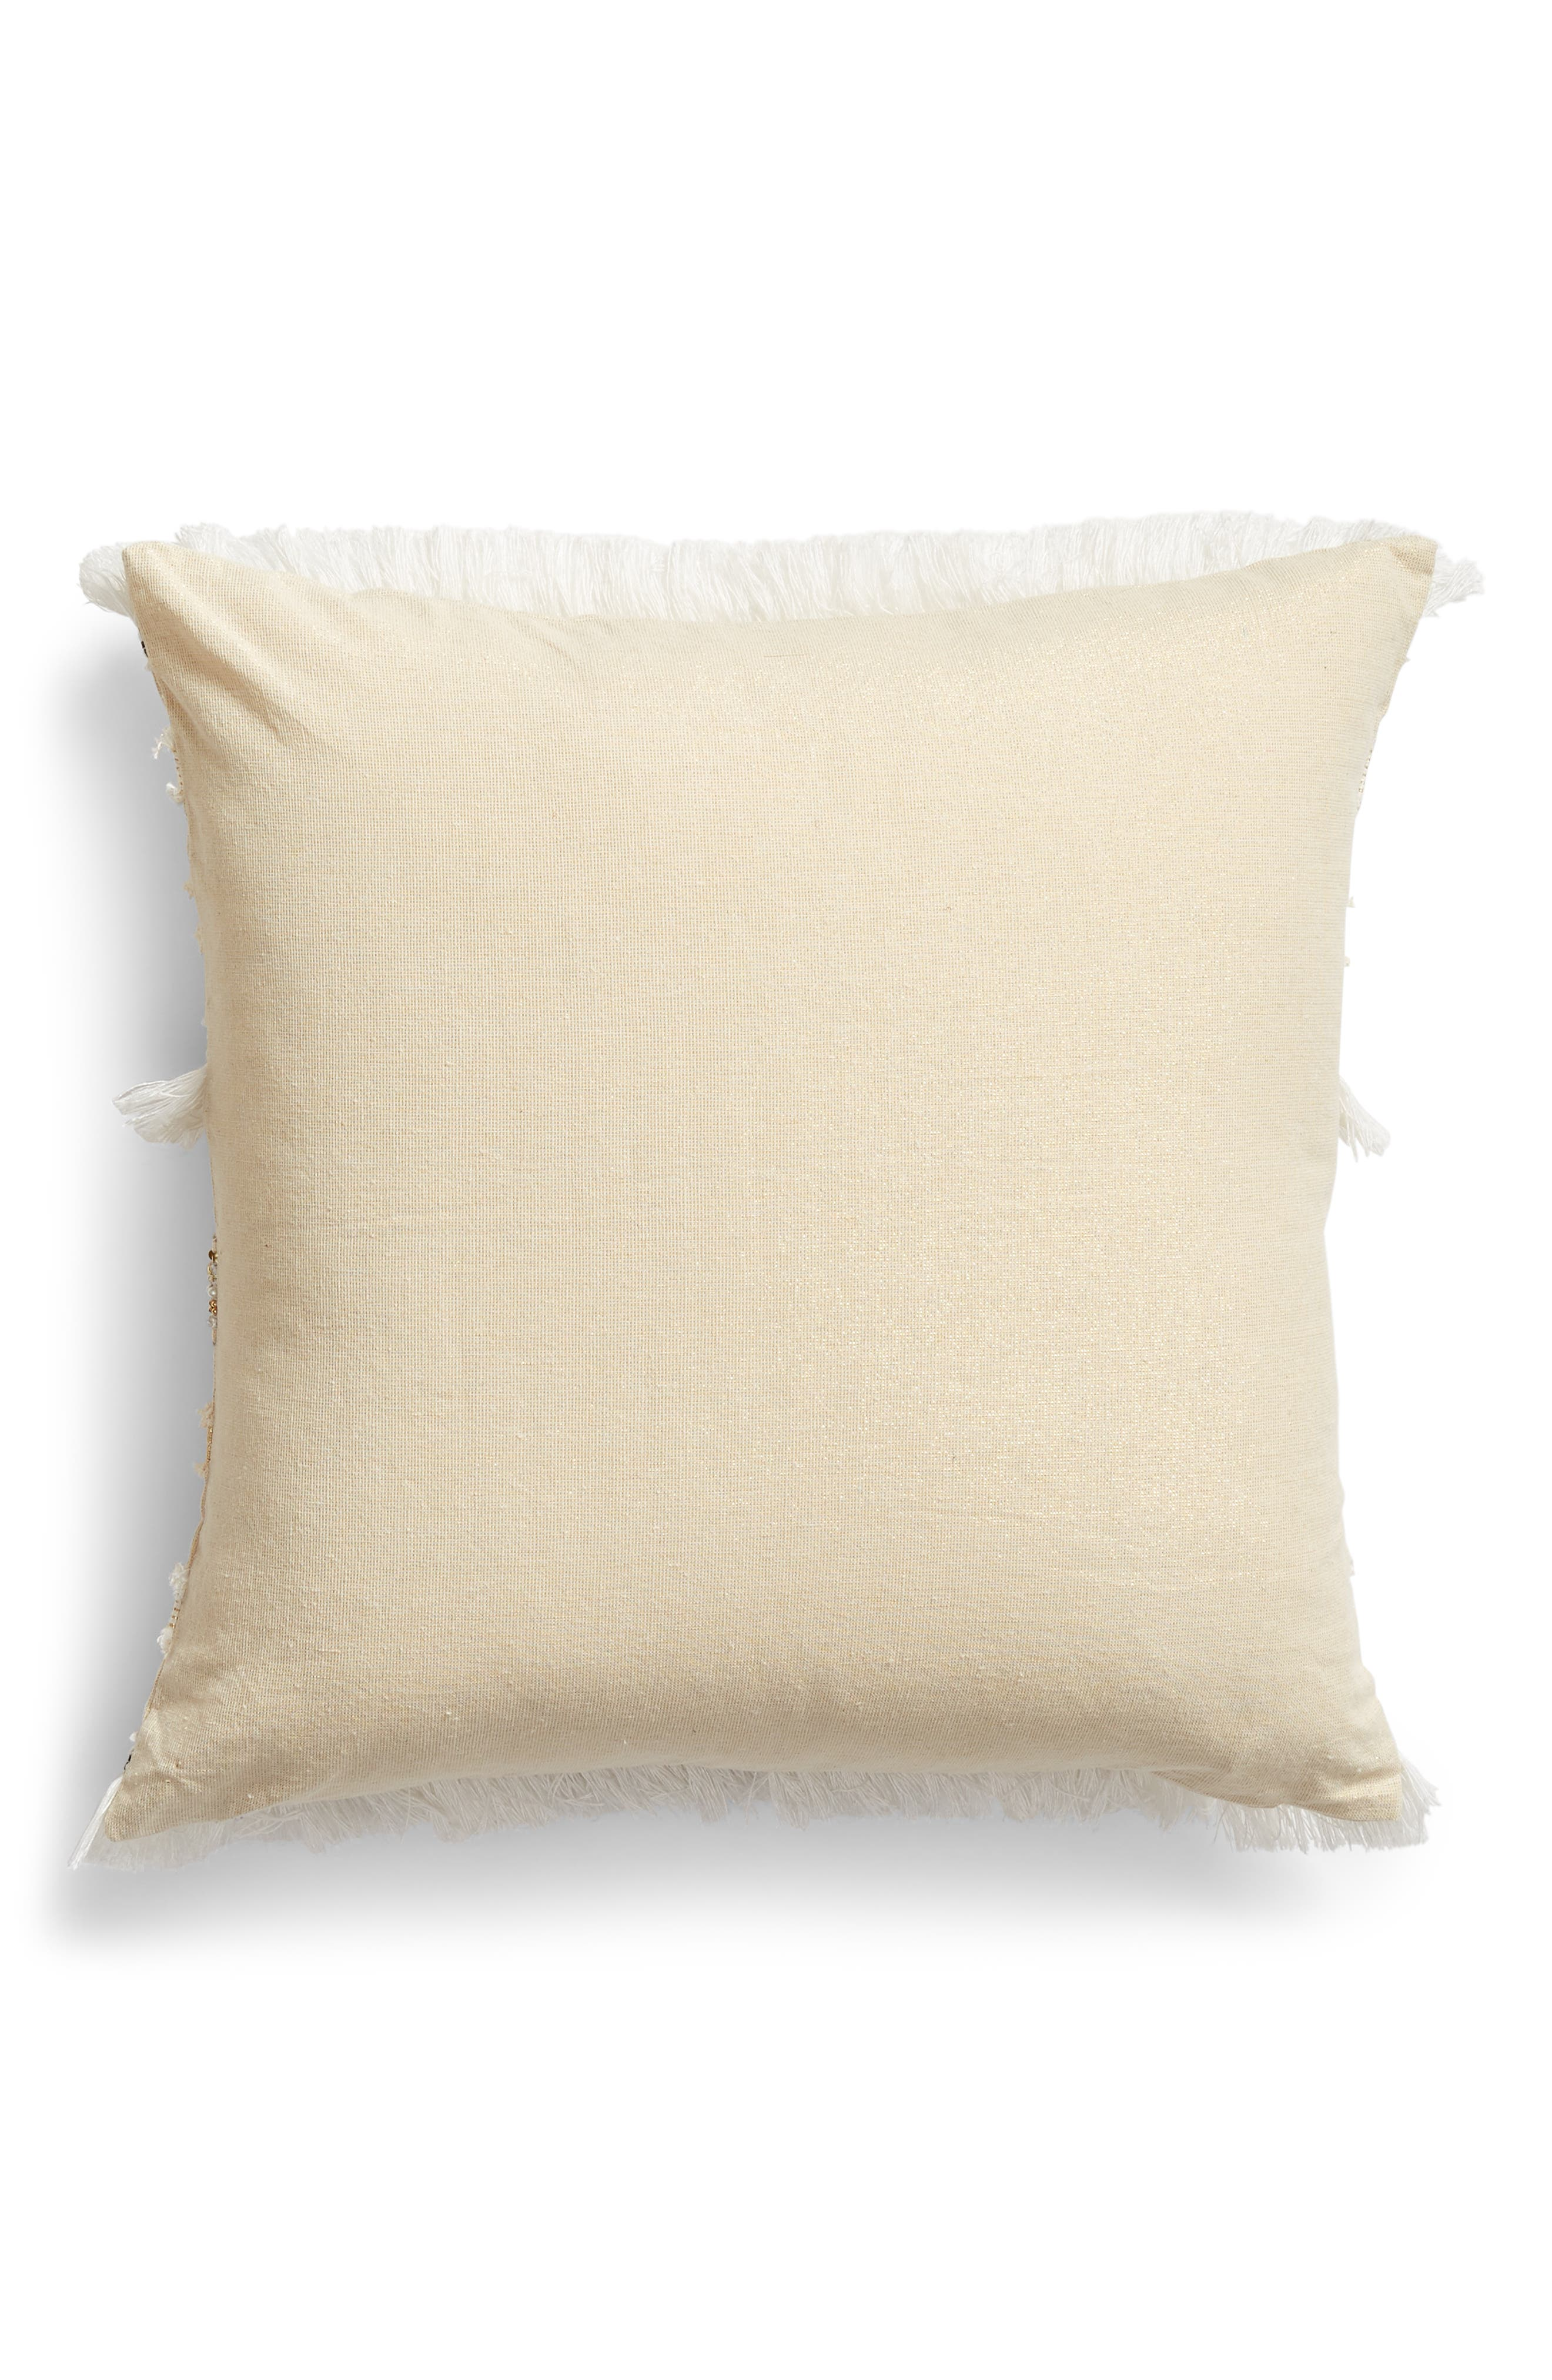 LEVTEX,                             Emory Trim Pillow,                             Alternate thumbnail 2, color,                             250